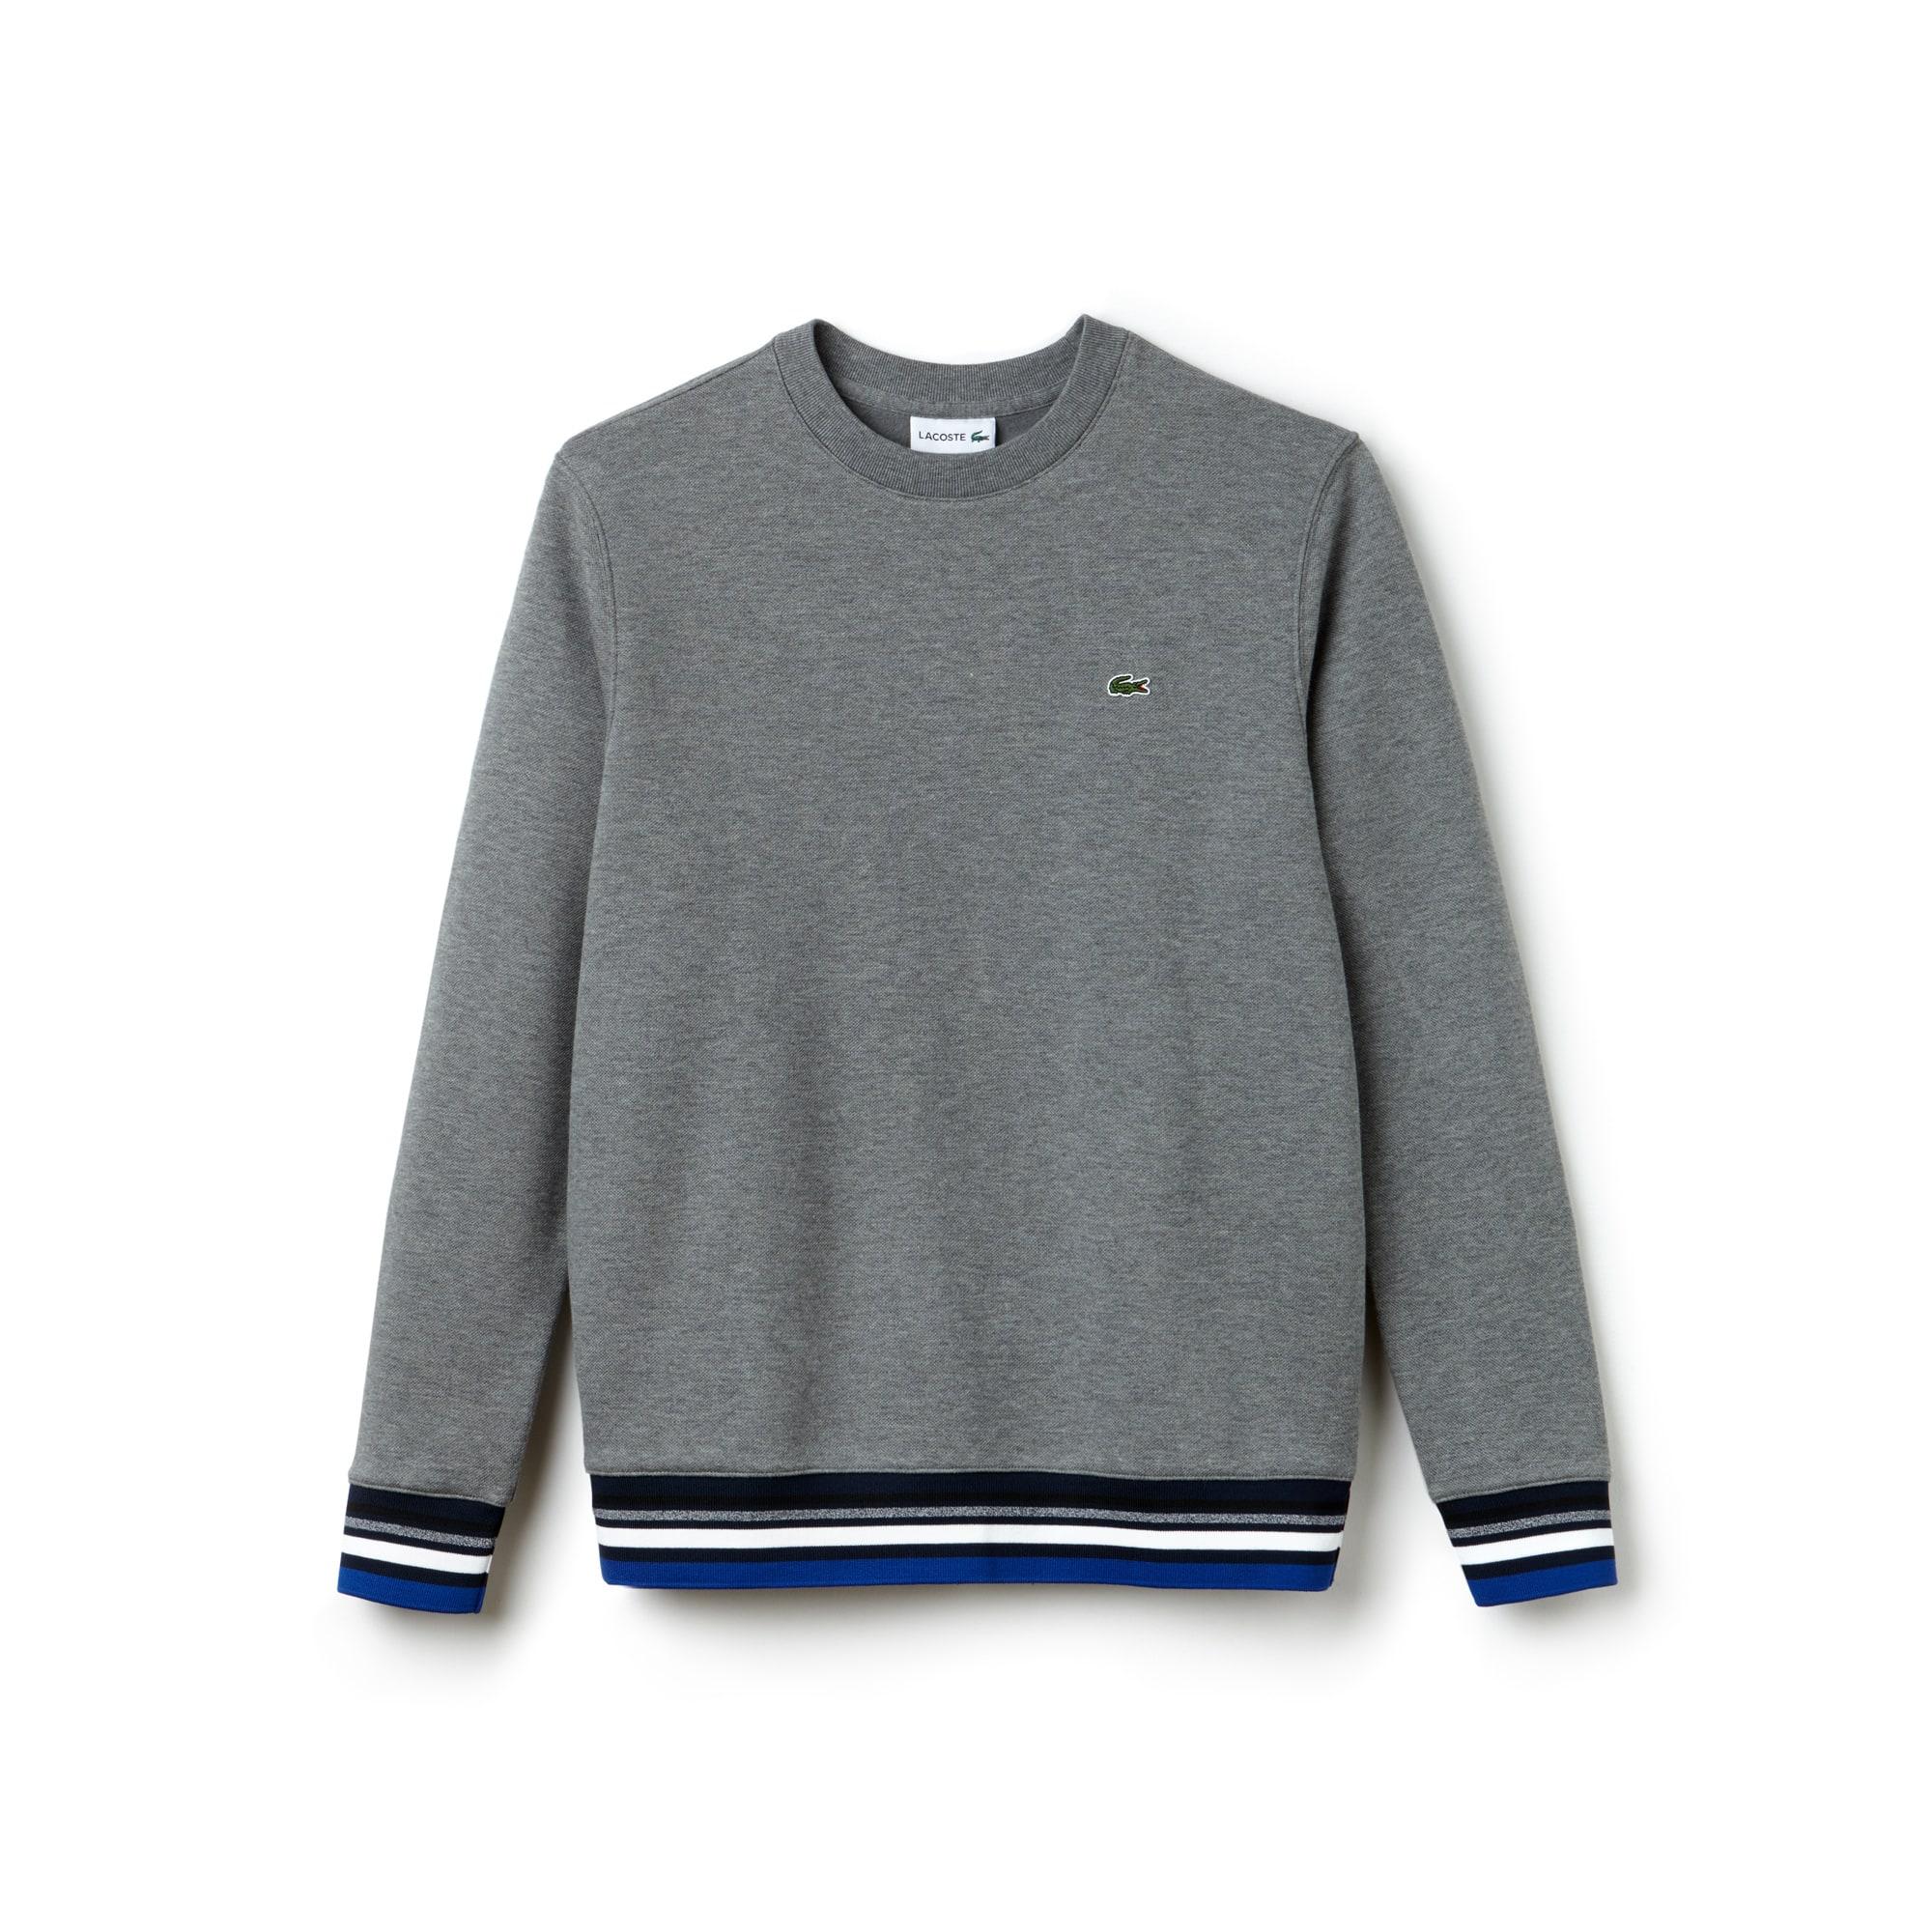 Herren-Sweatshirt aus Fleece mit Streifenmuster